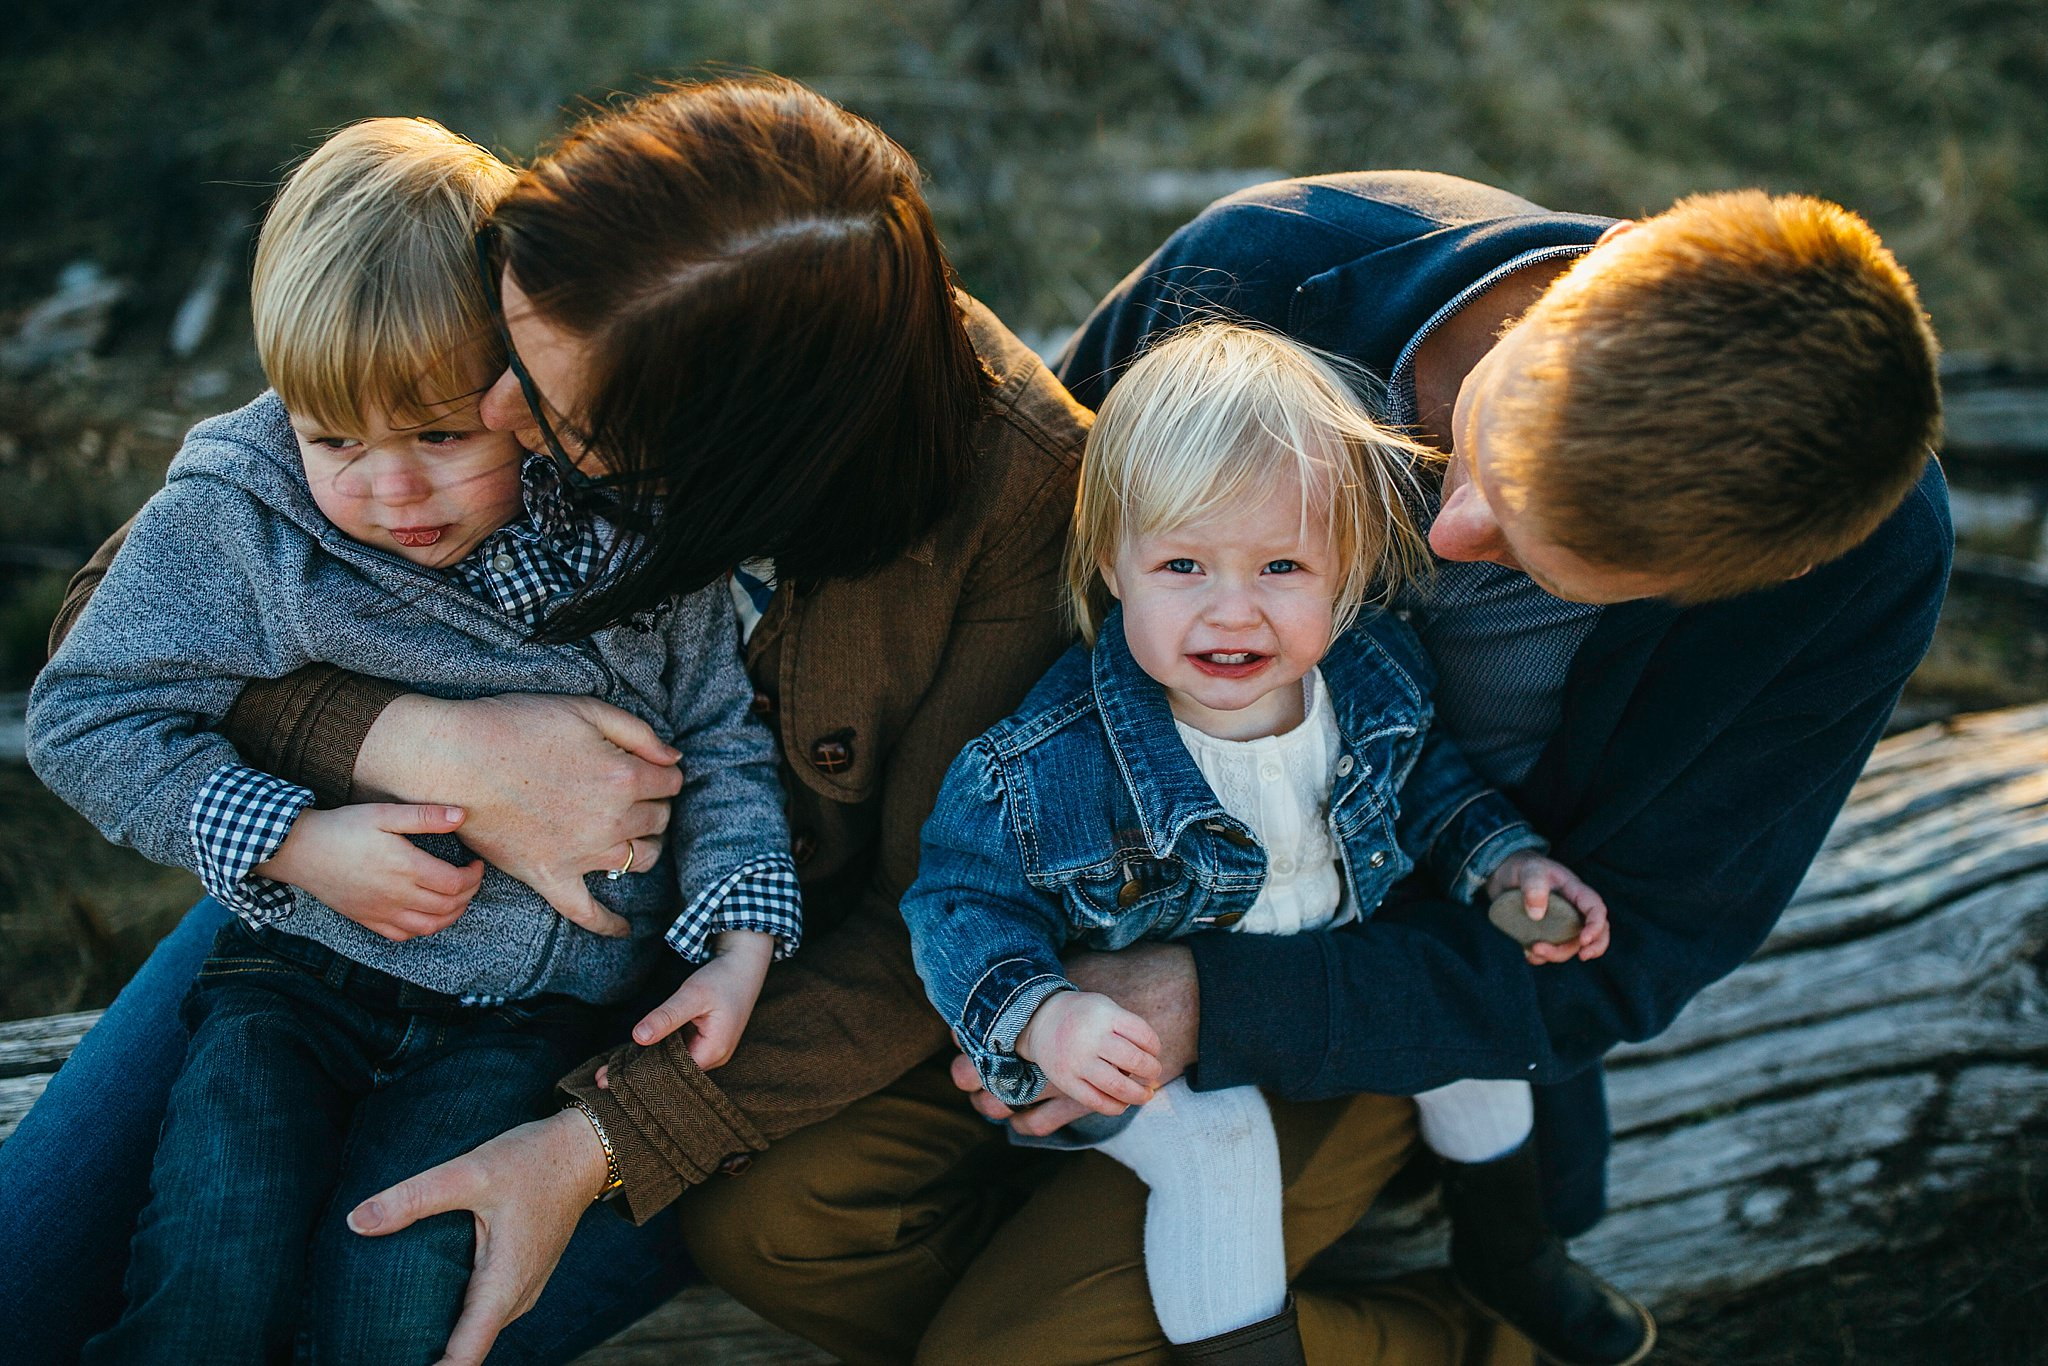 anacortes-family-photographer_0038.jpg